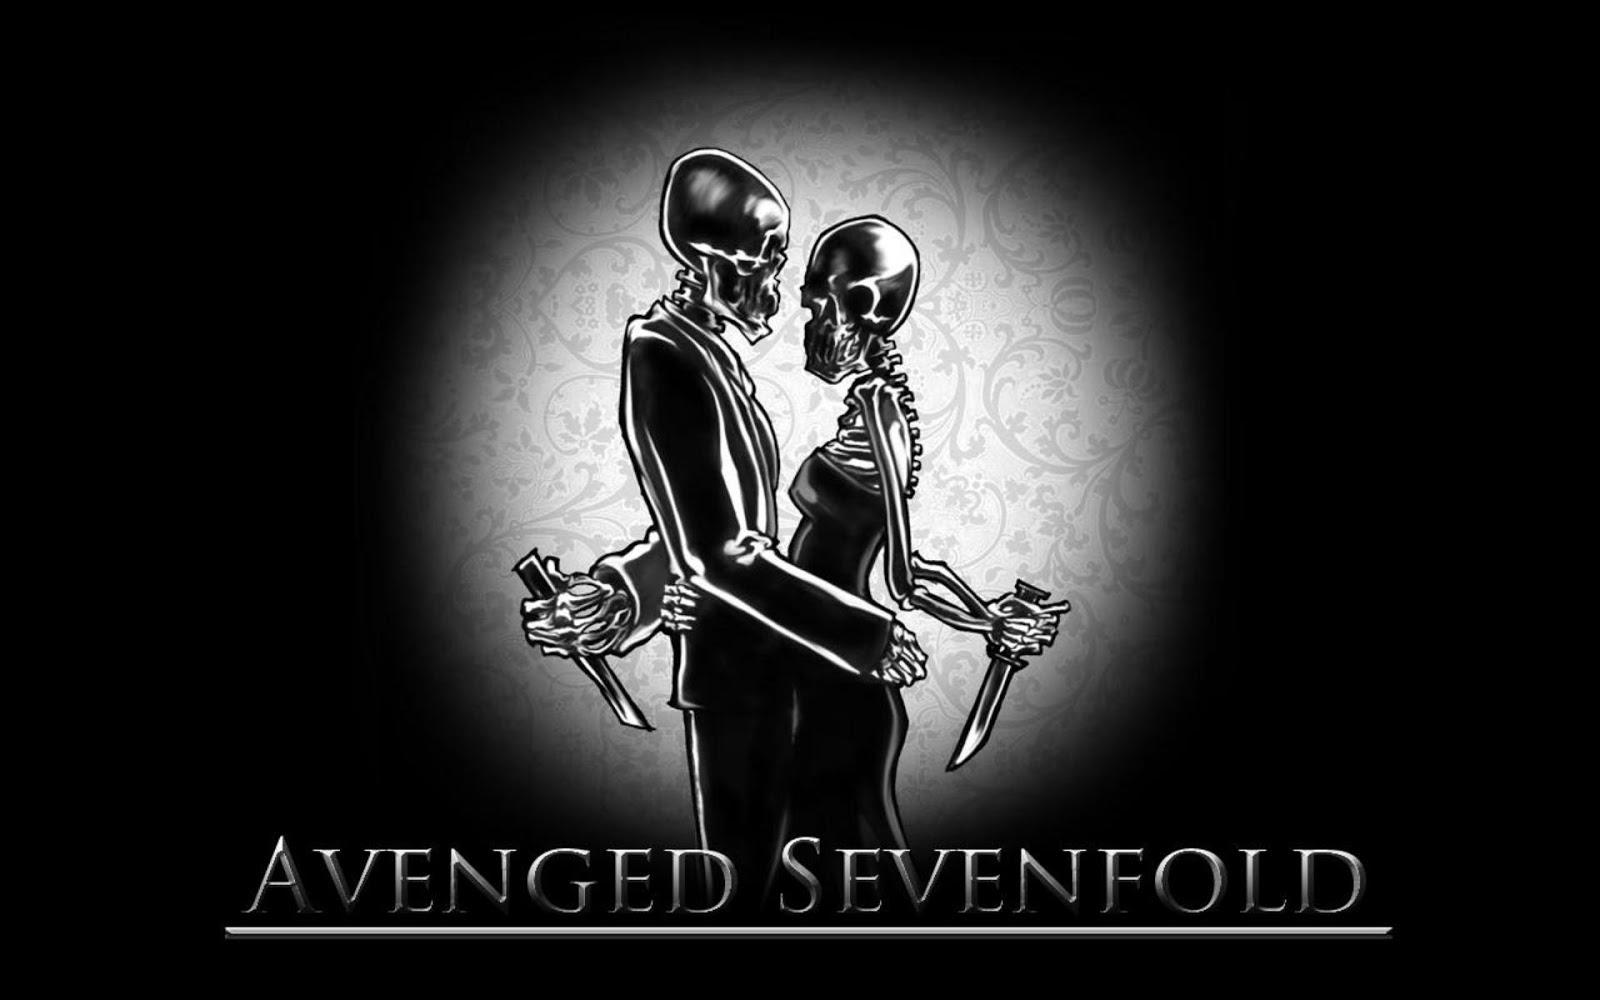 Avenged Sevenfold Wallpaper High on 2013 06 01 Archive